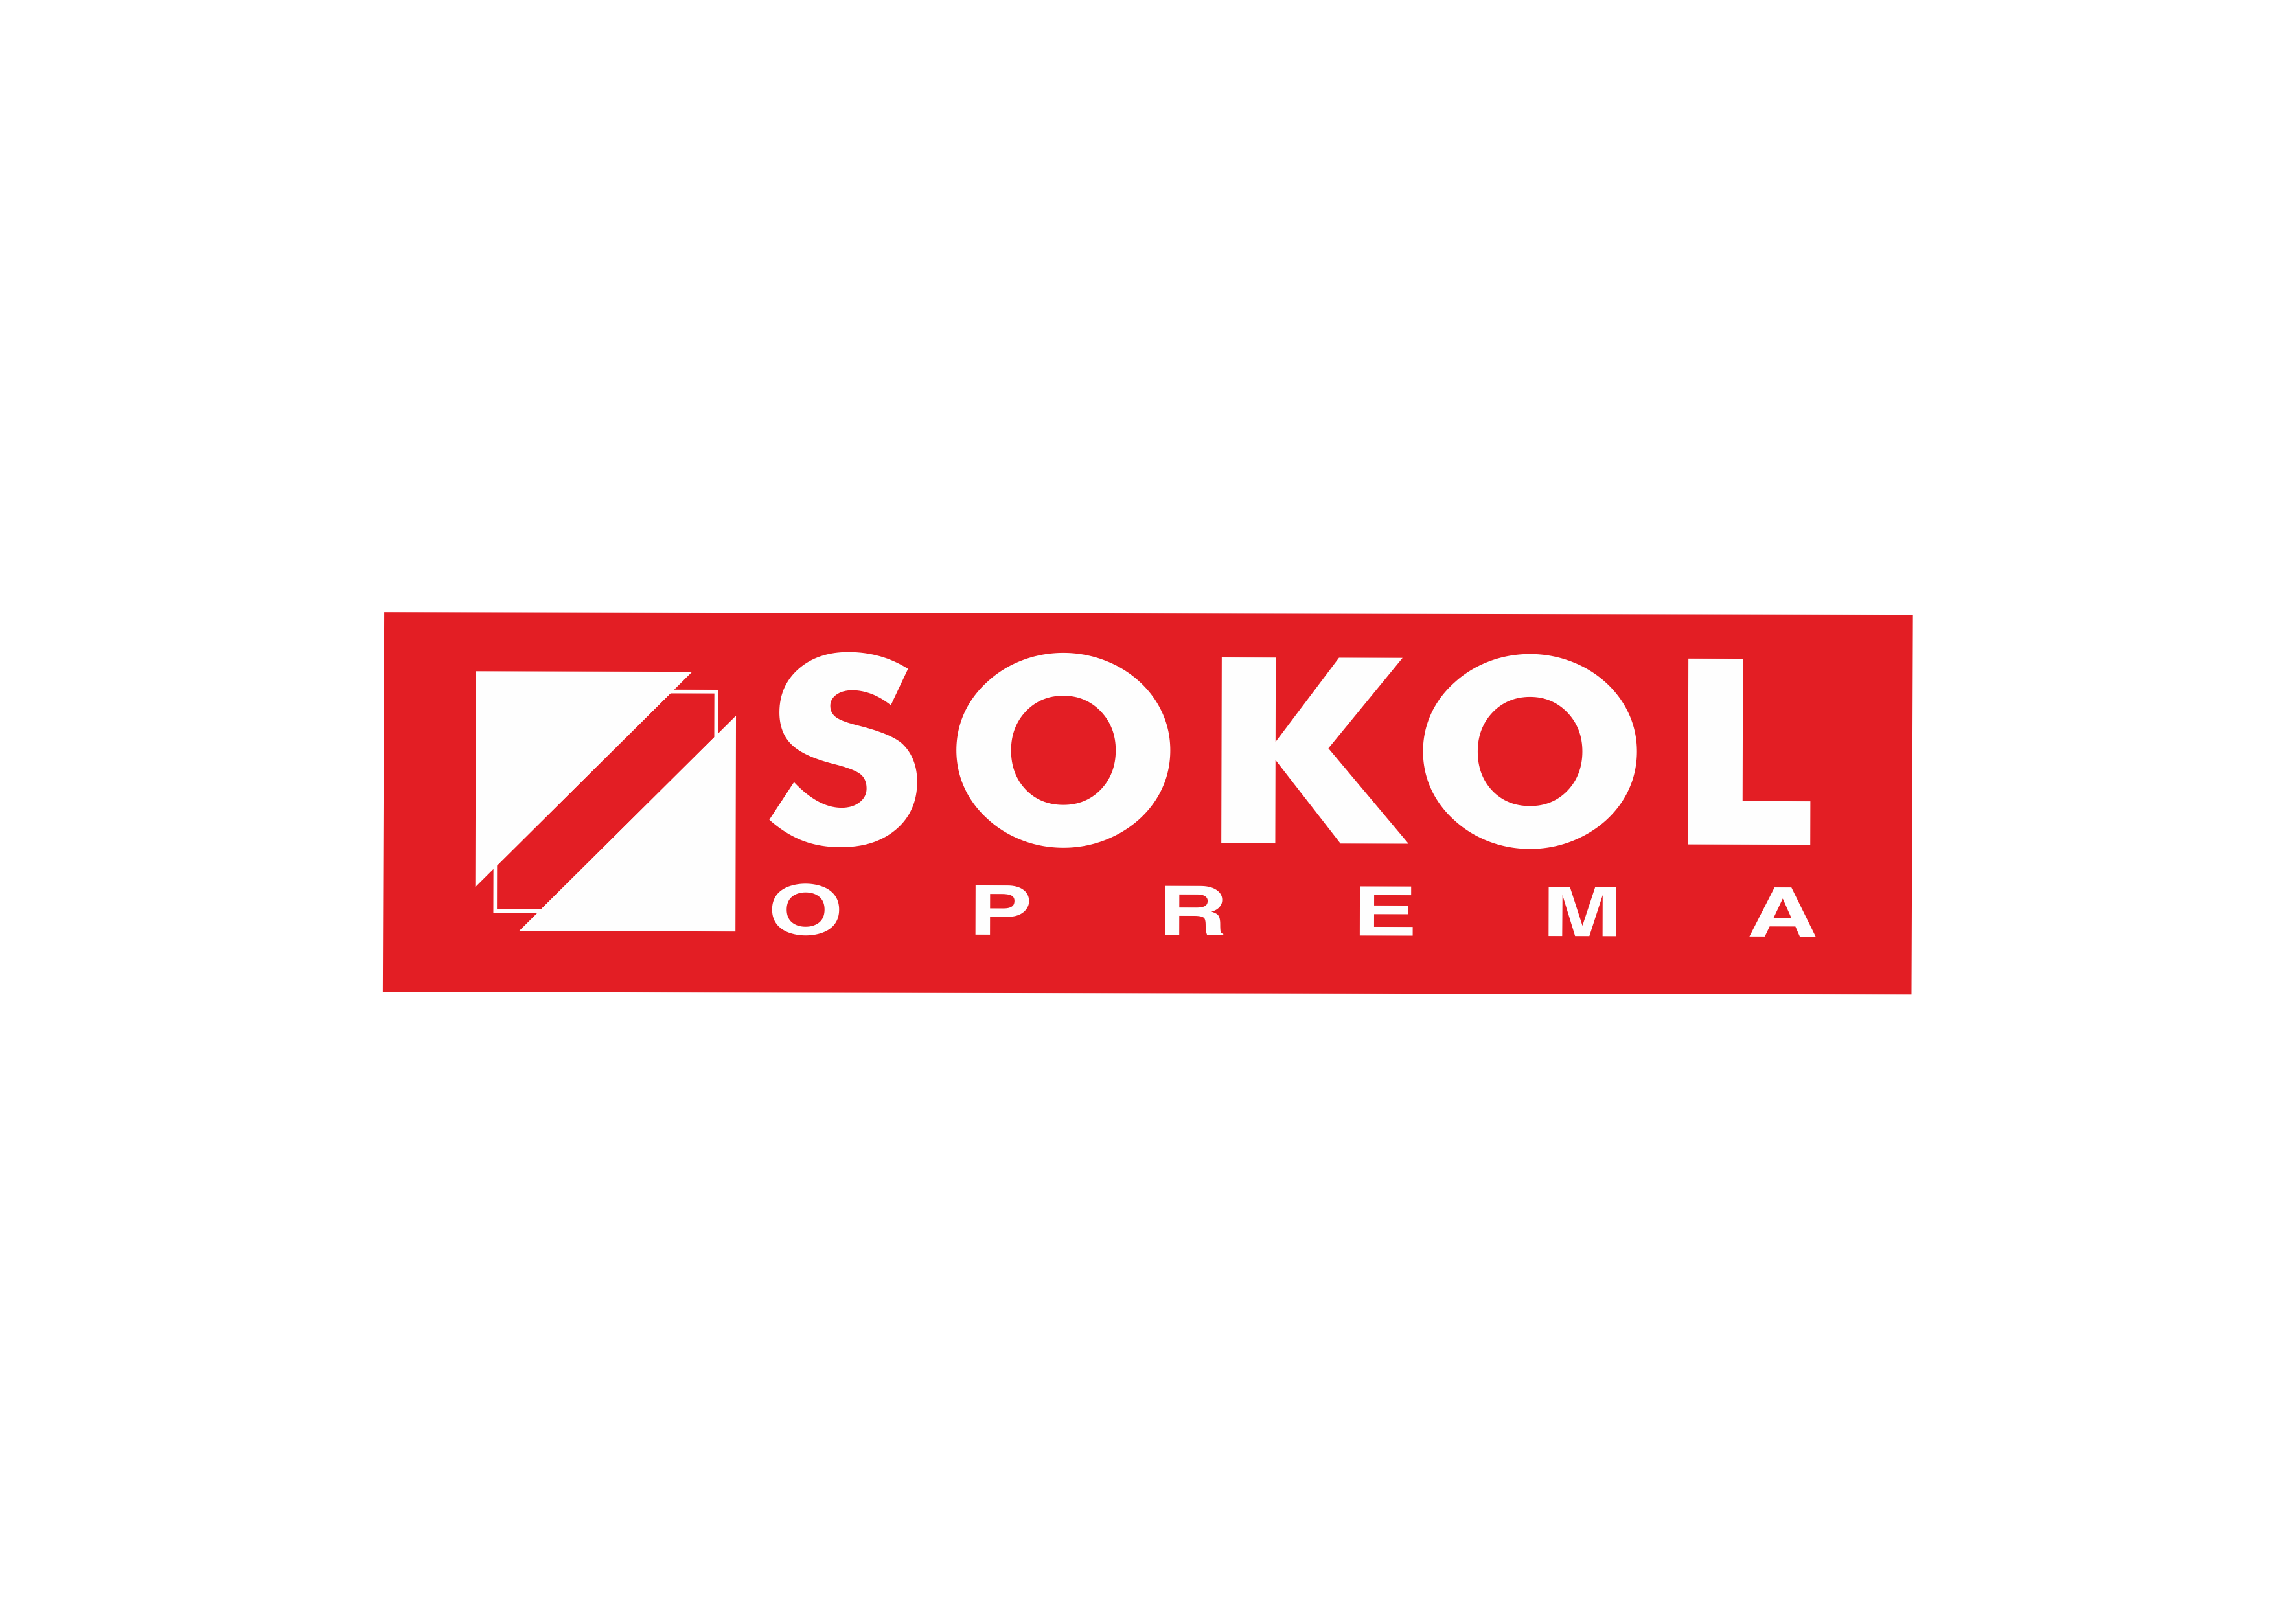 sokol-oprema